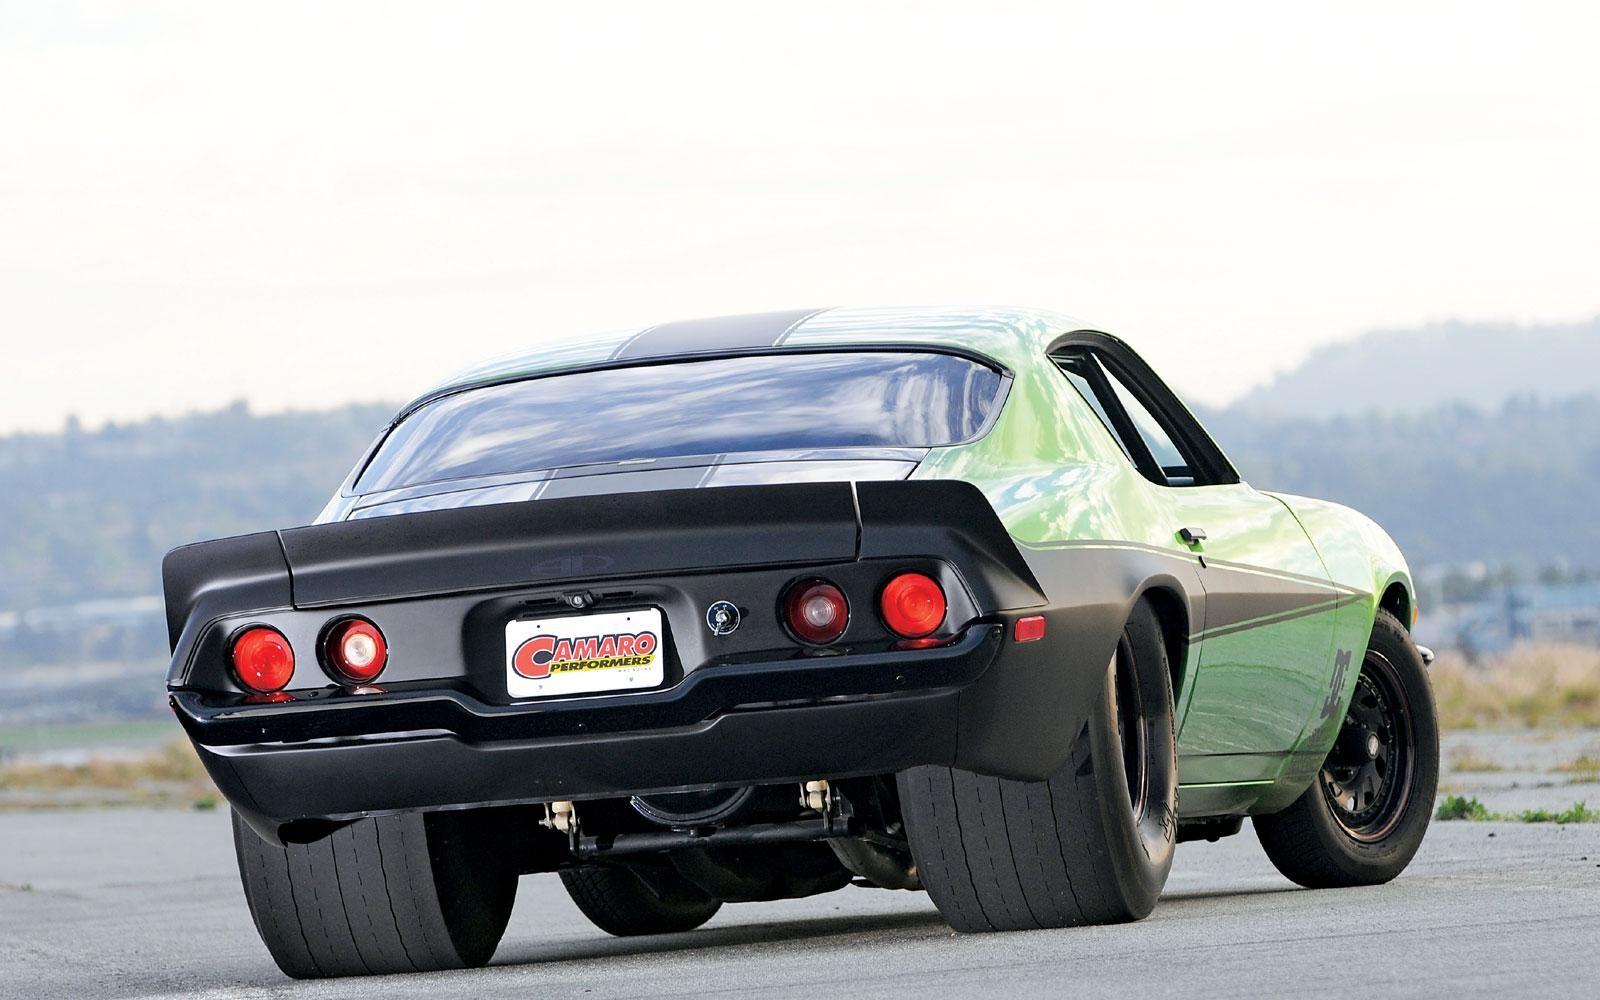 1971 Chevy Camaro DC Pro Street | Wish List | Pinterest | Cars ...